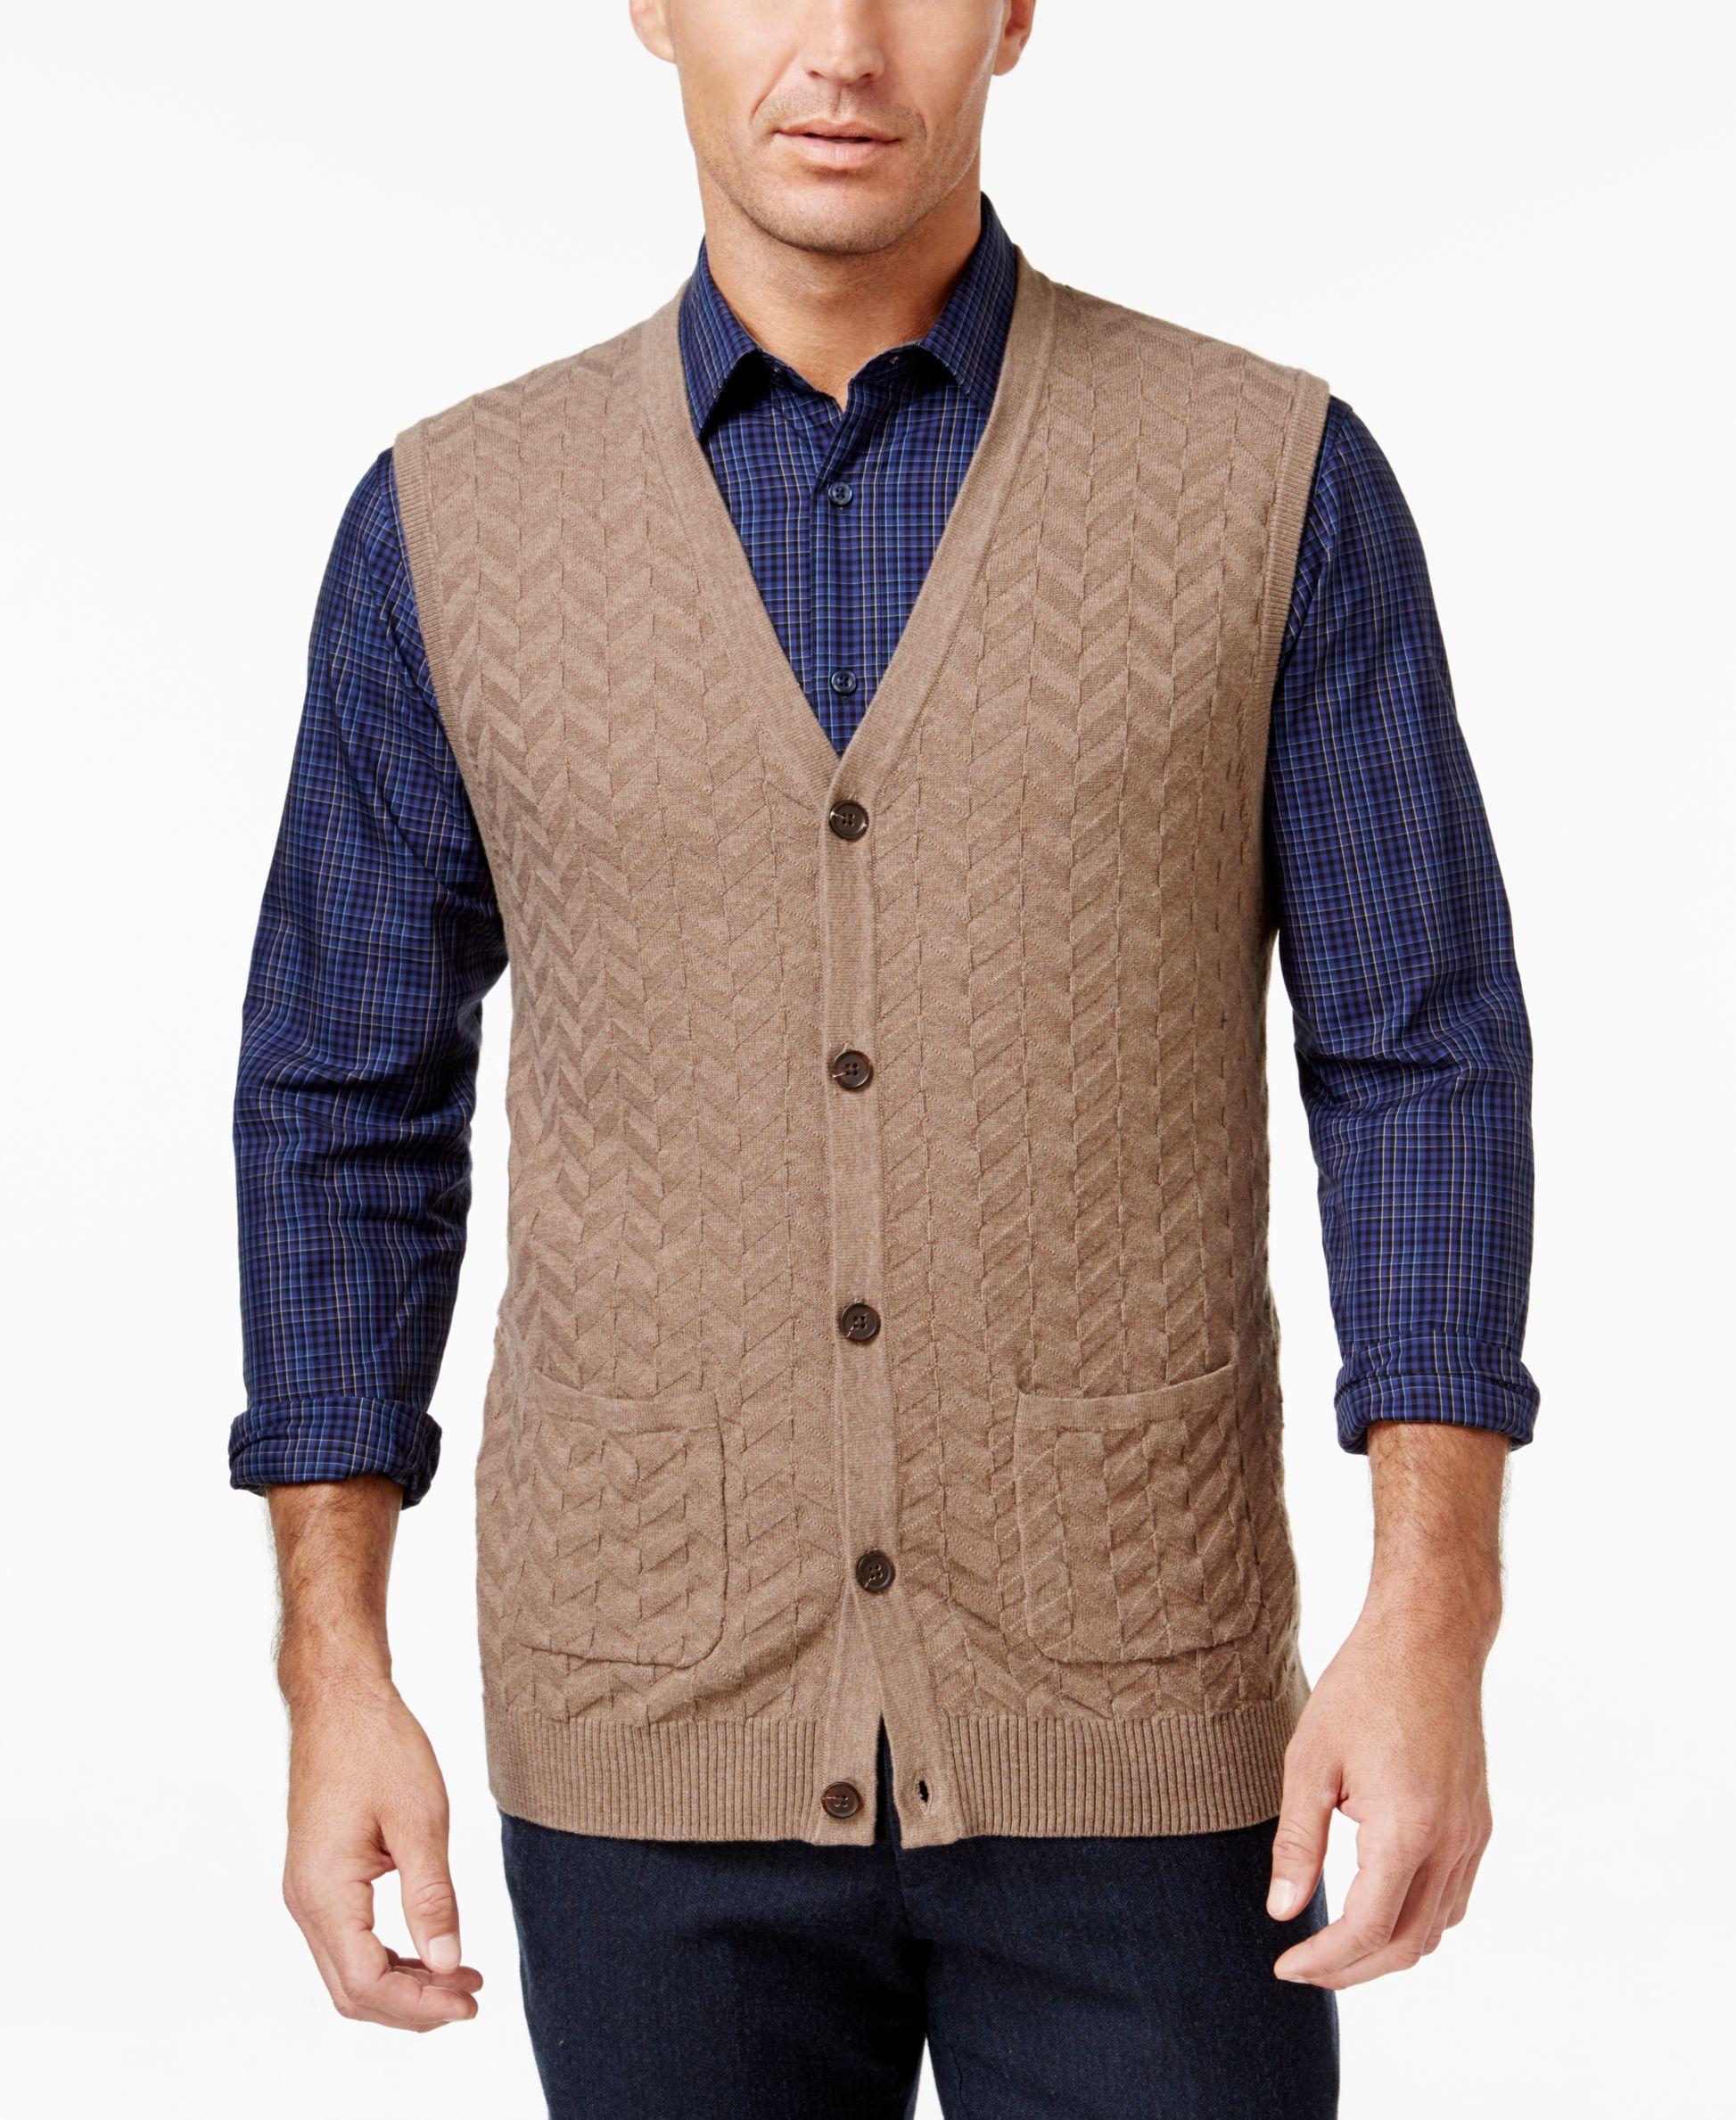 Tasso Elba Men's Chevron Sweater Vest, Only at Macy's | Cardigans ...